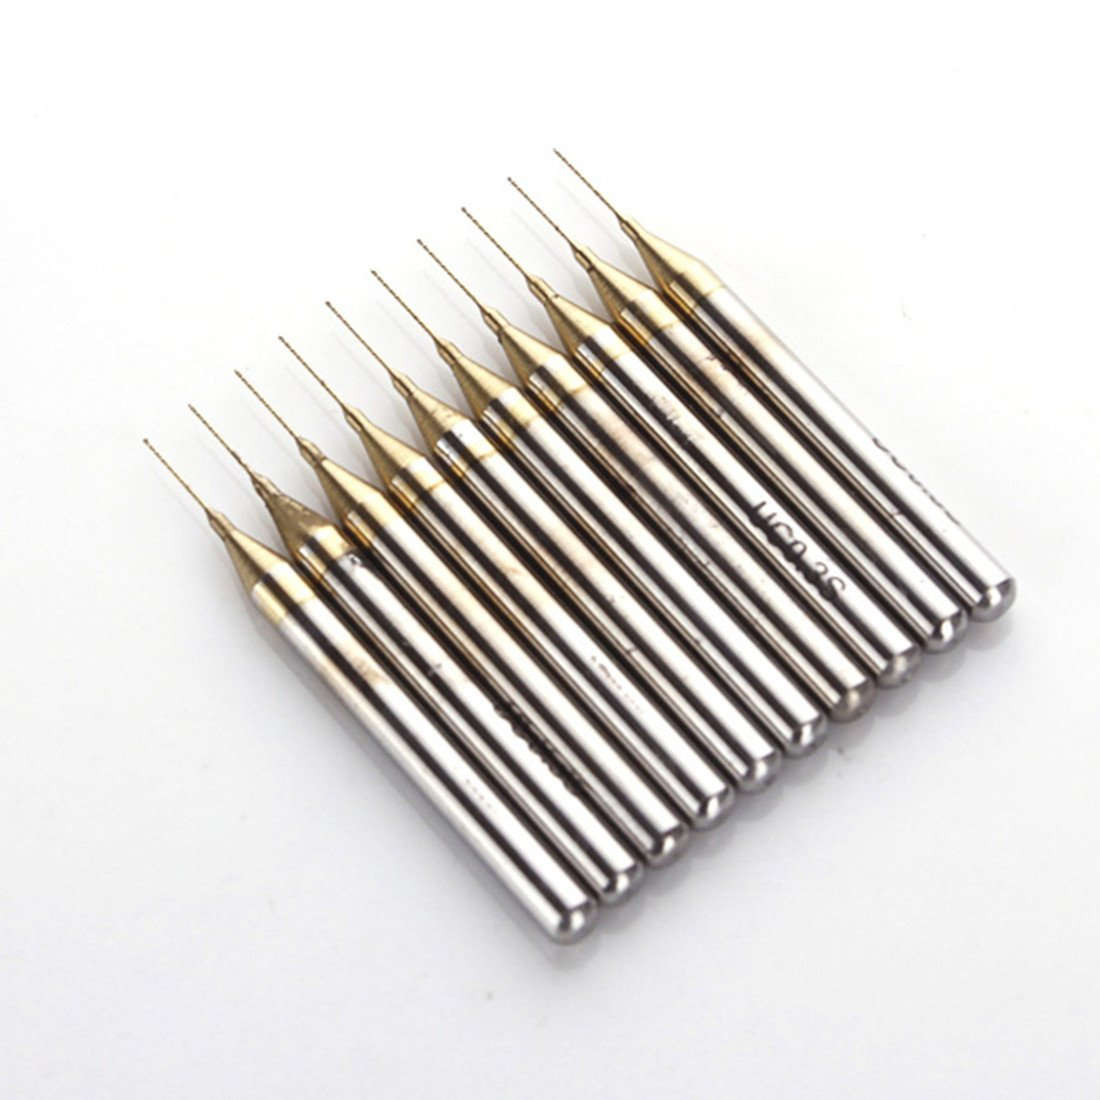 Pack 10 x puntas grabado, Brocas para taladro nitruro de titanio metal de PCB Dremel joyas CNC - Broca 0.3 mm Router SMO